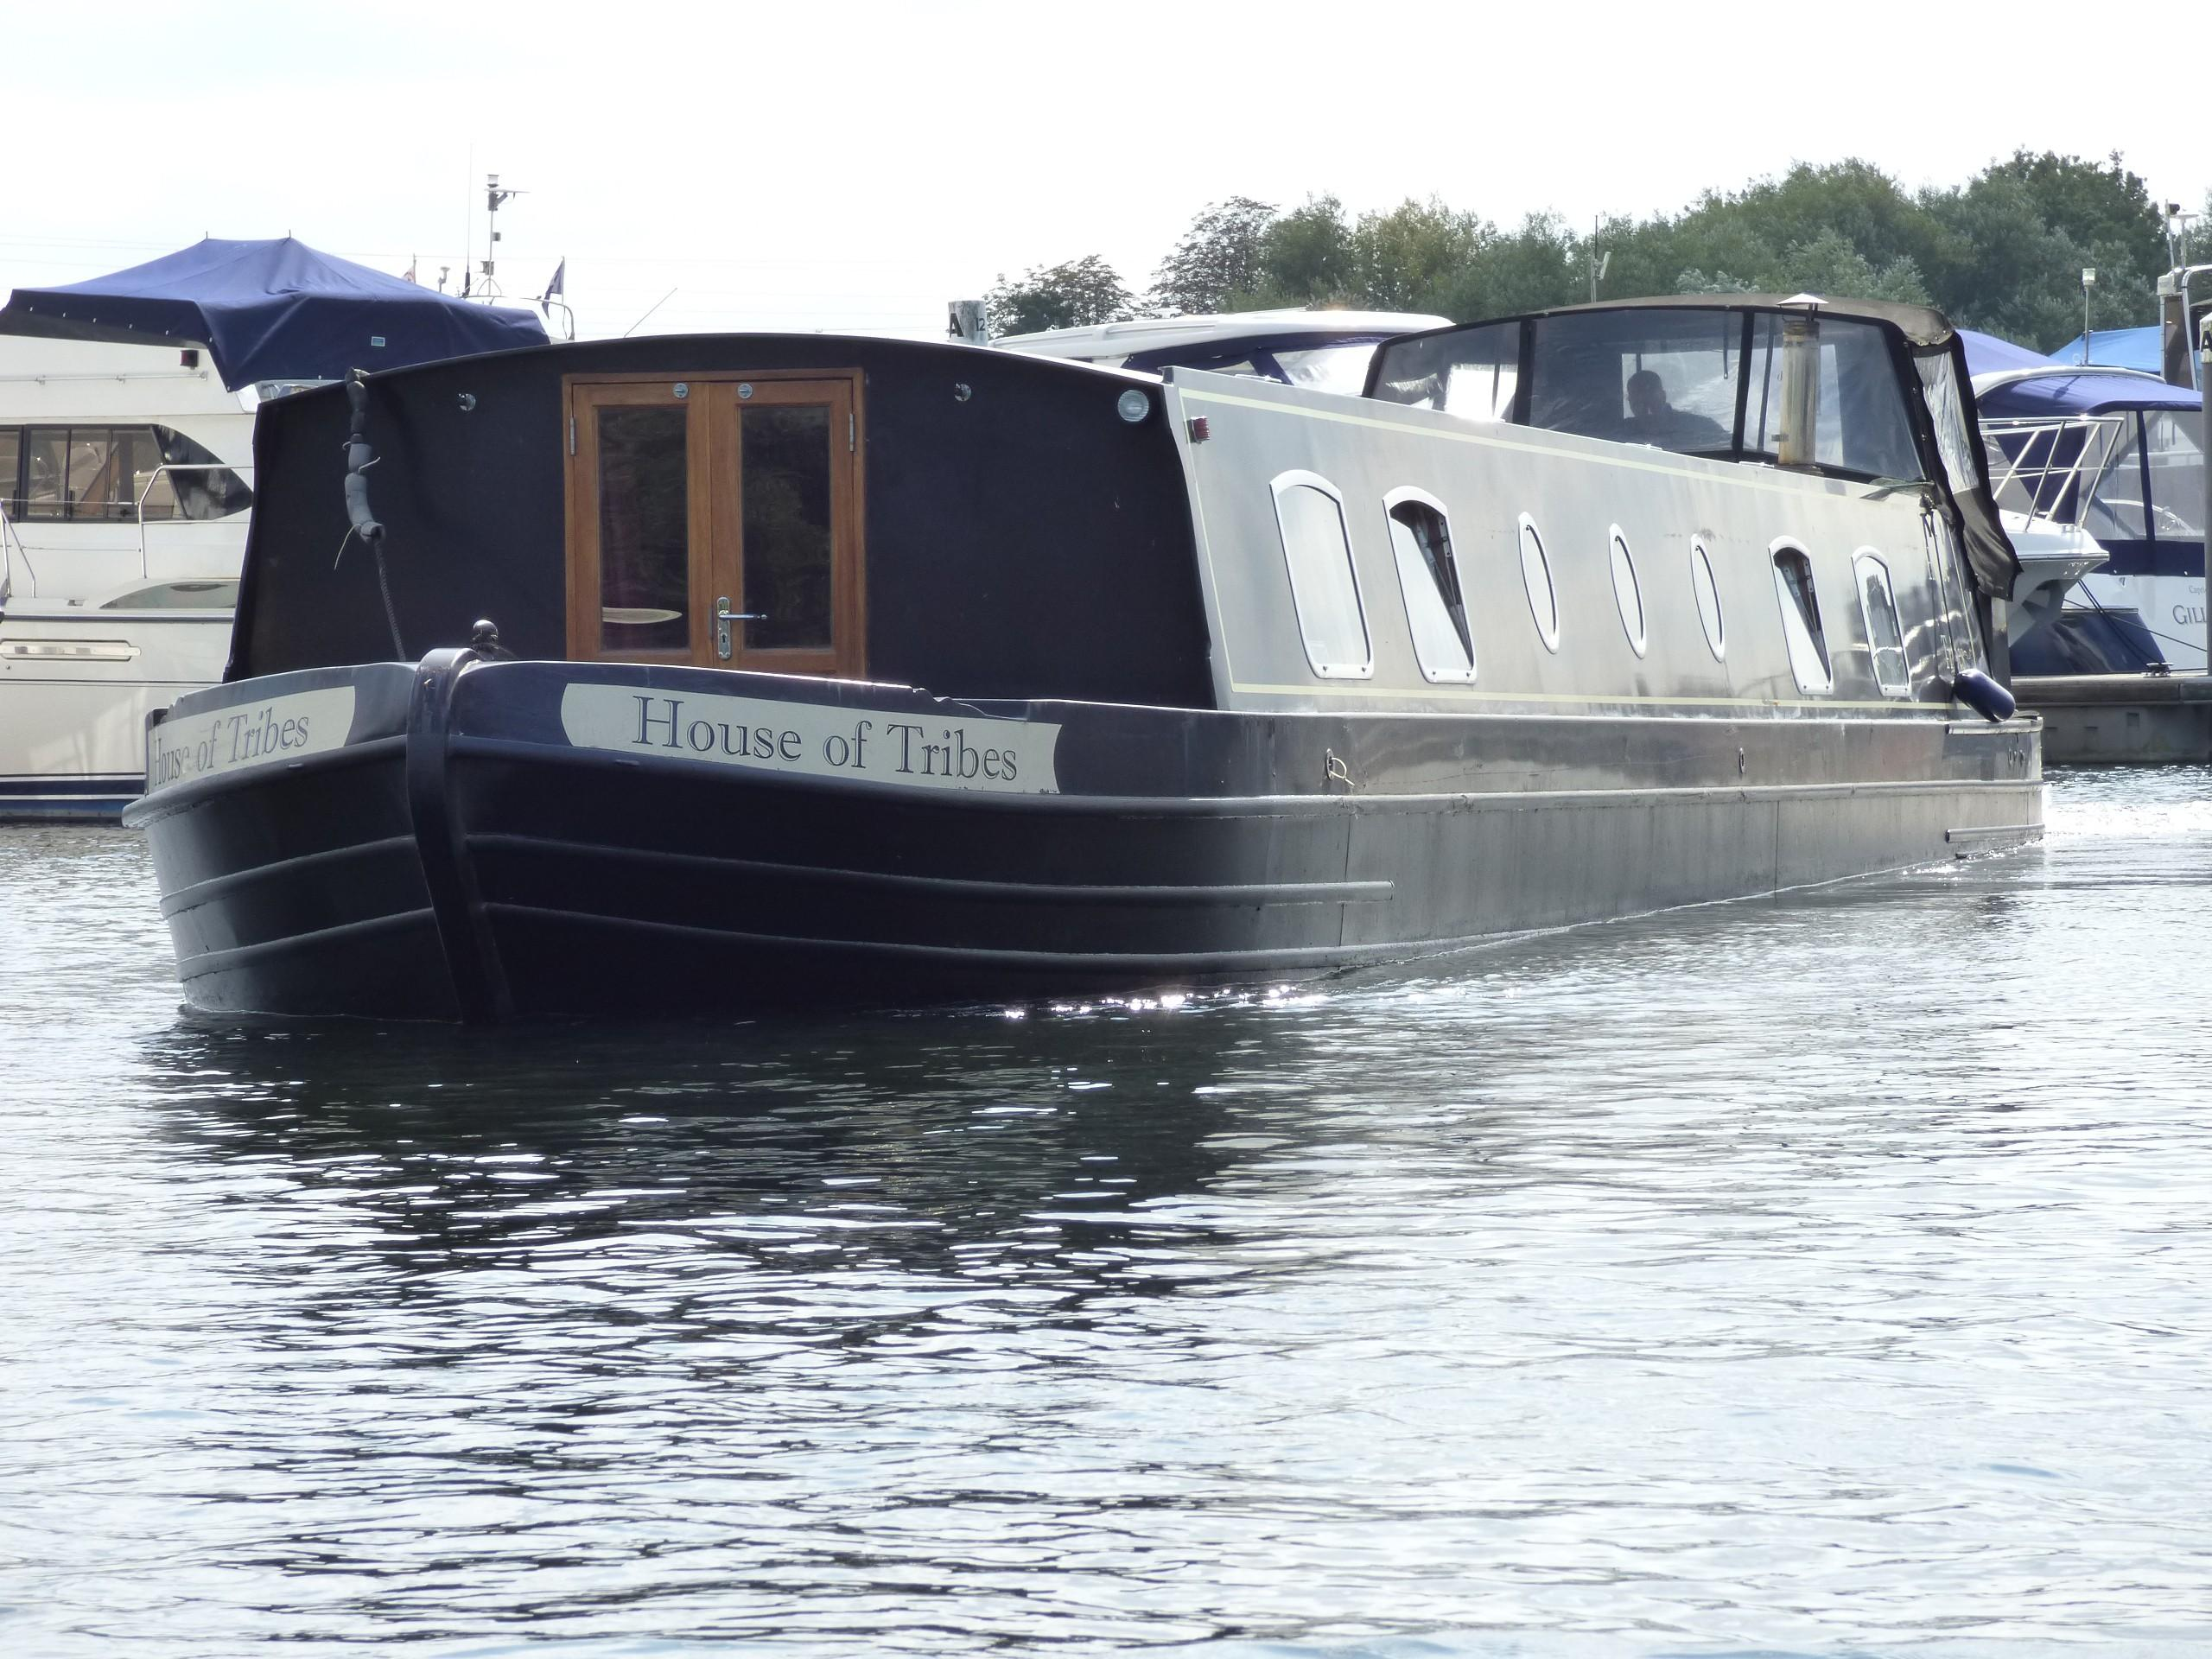 Wide Beam Narrowboat Metrofloat Henley 64' x 11'